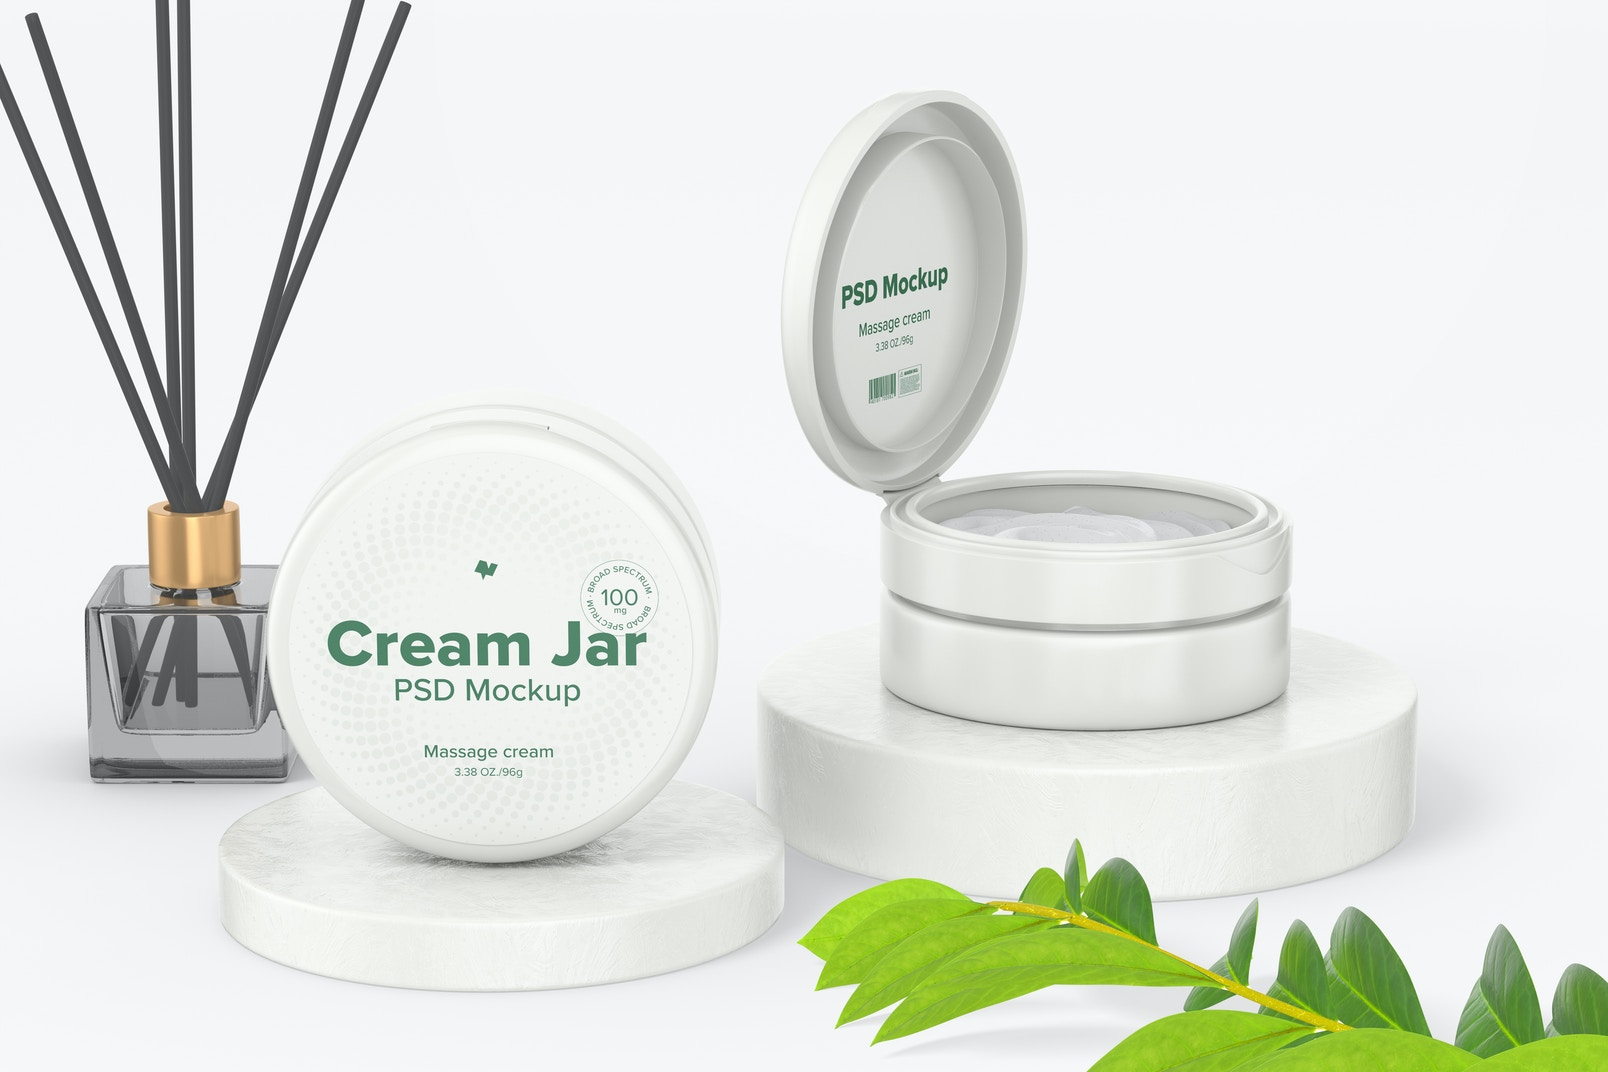 3.38 oz Cream Jars Mockup, Perspective View